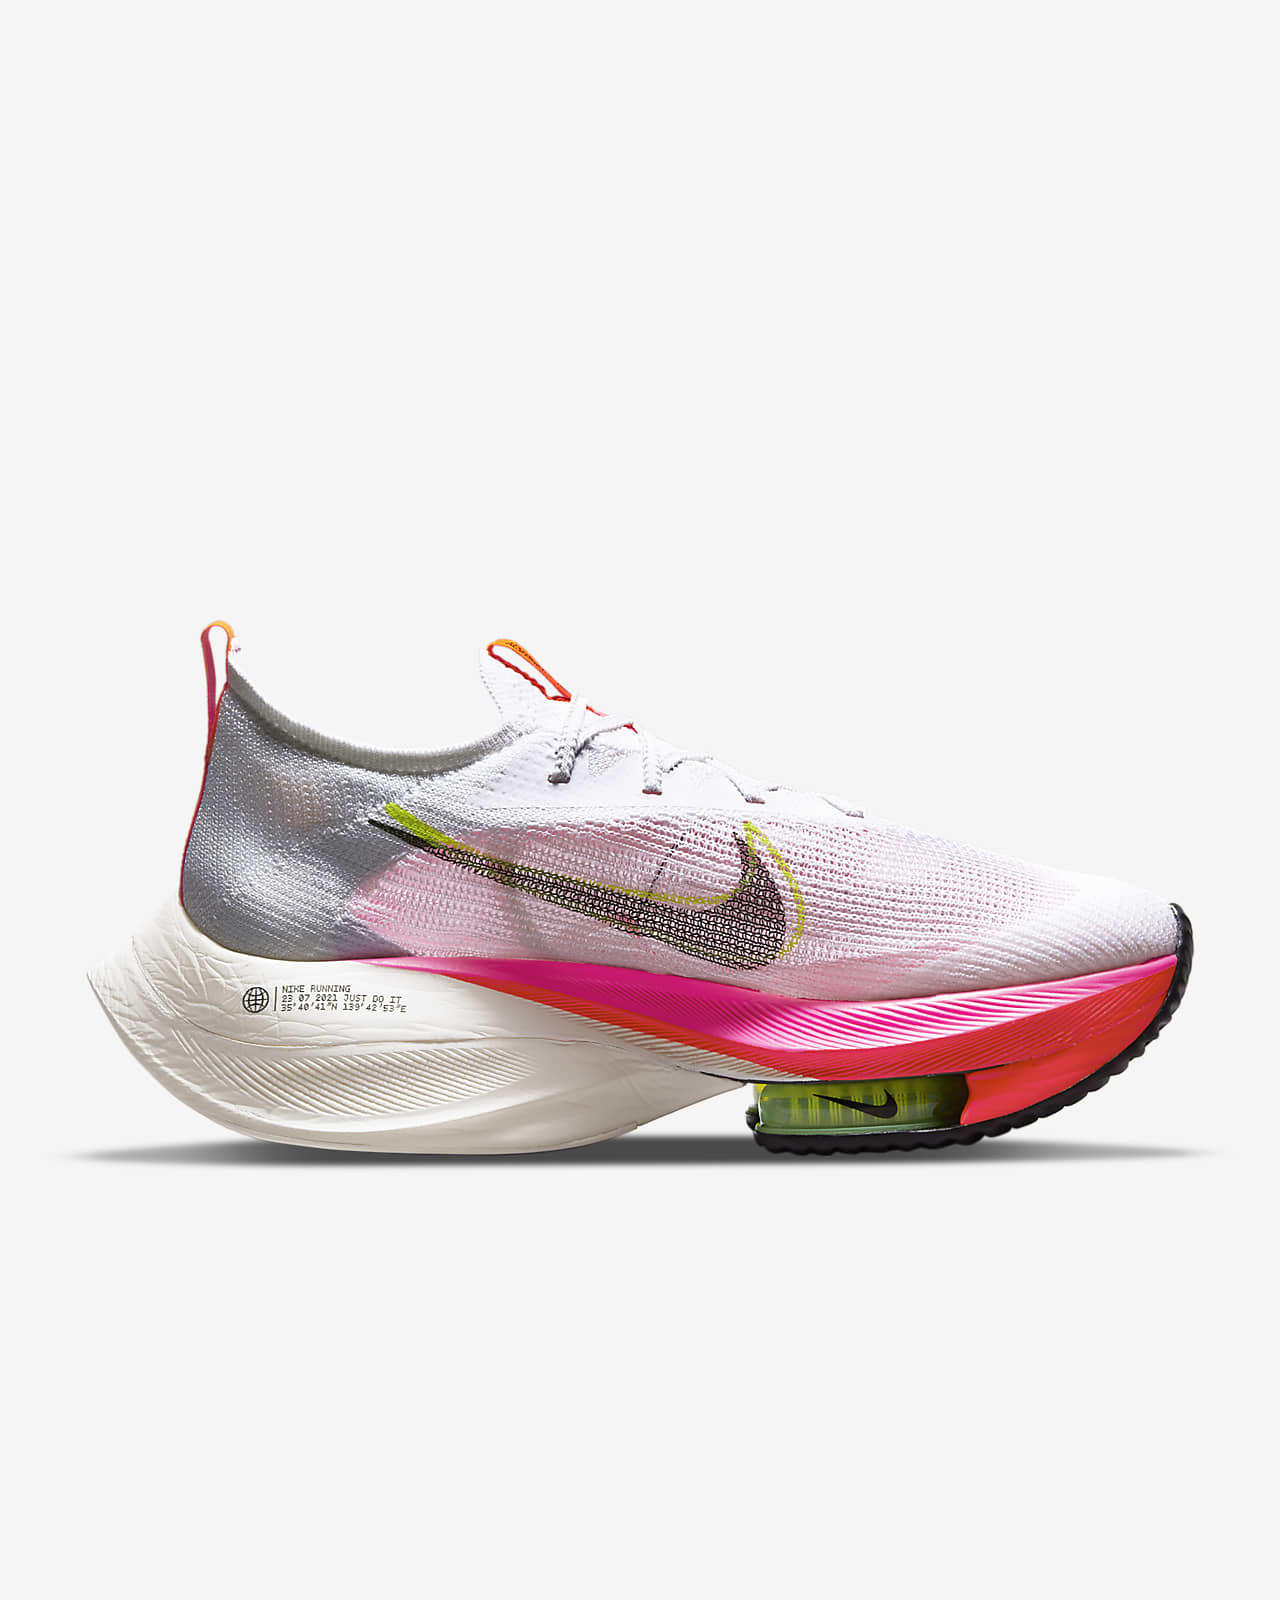 Nike Air Zoom Alphafly NEXT% Flyknit Men's Road Racing Shoe